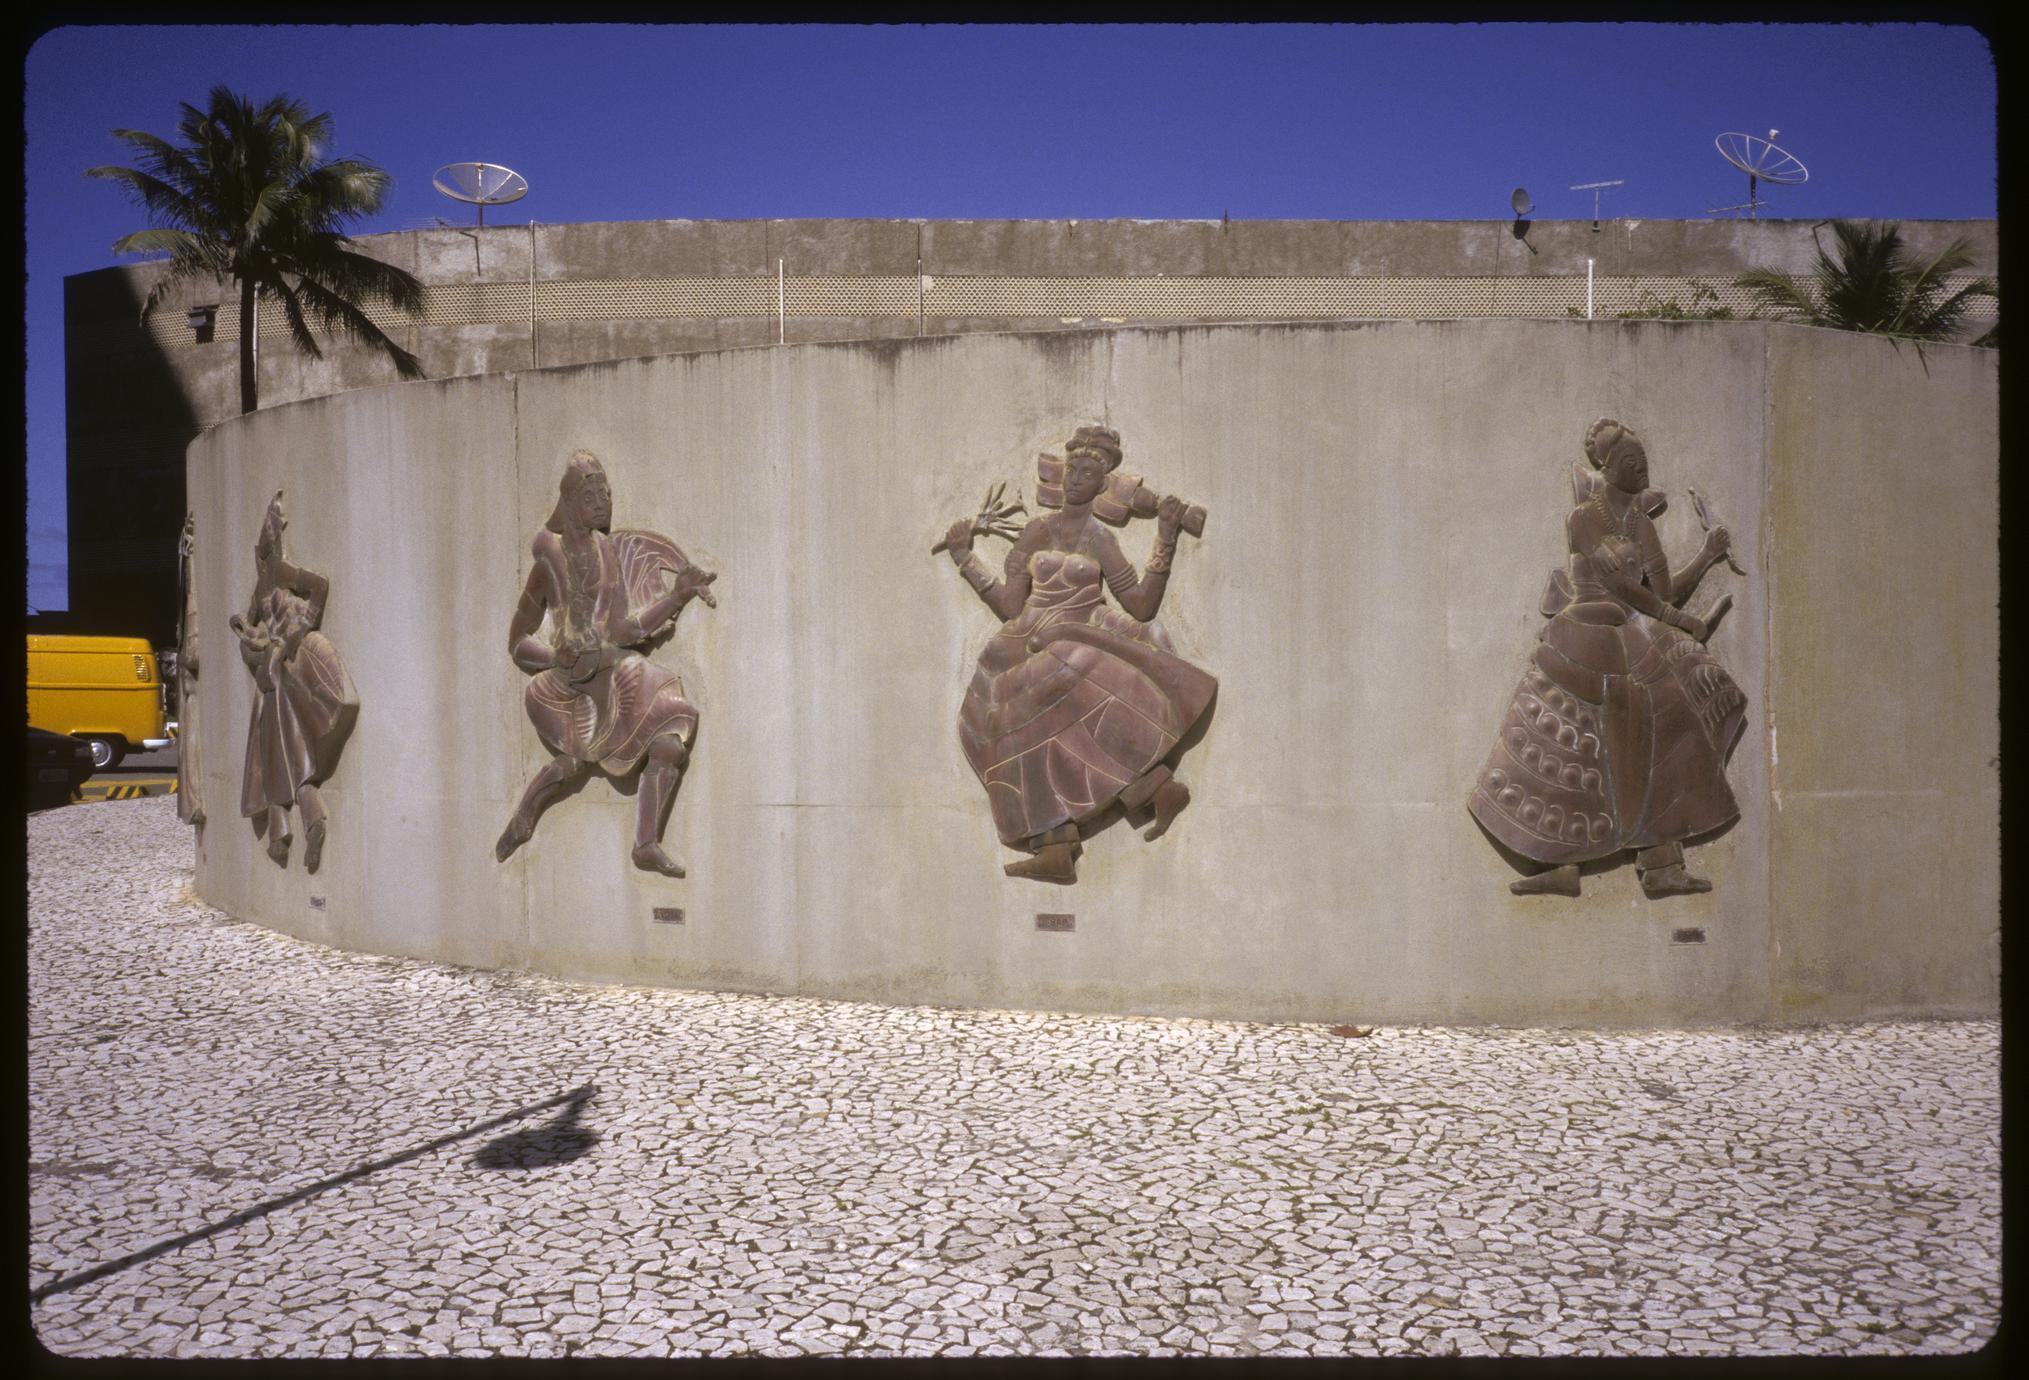 Wall of Orixa (Orisa / Orisha) Sculptures by Mario Cravo (1 of 11)